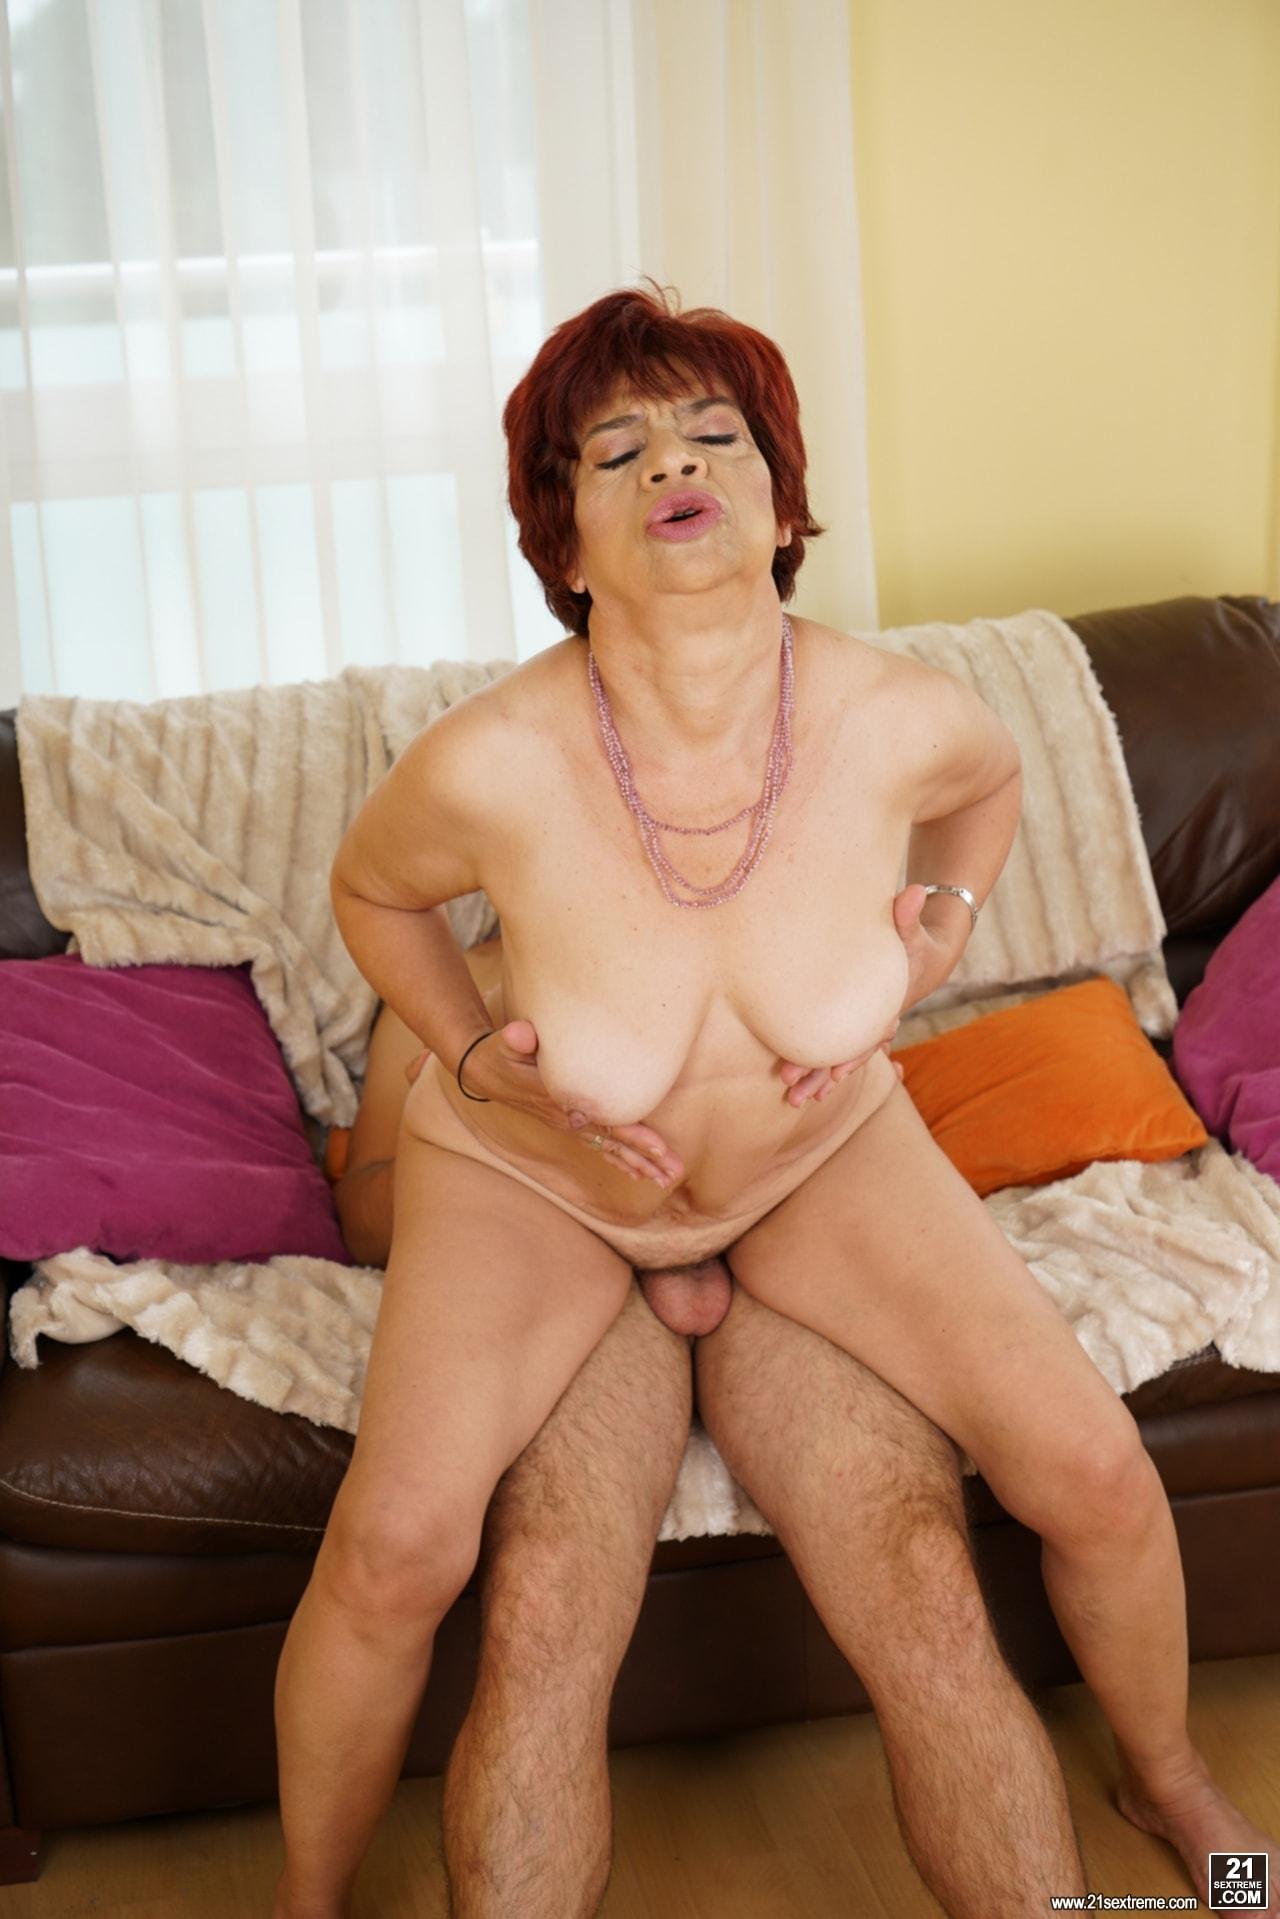 21Sextury 'A Taste of Experience' starring Donatella (Photo 209)